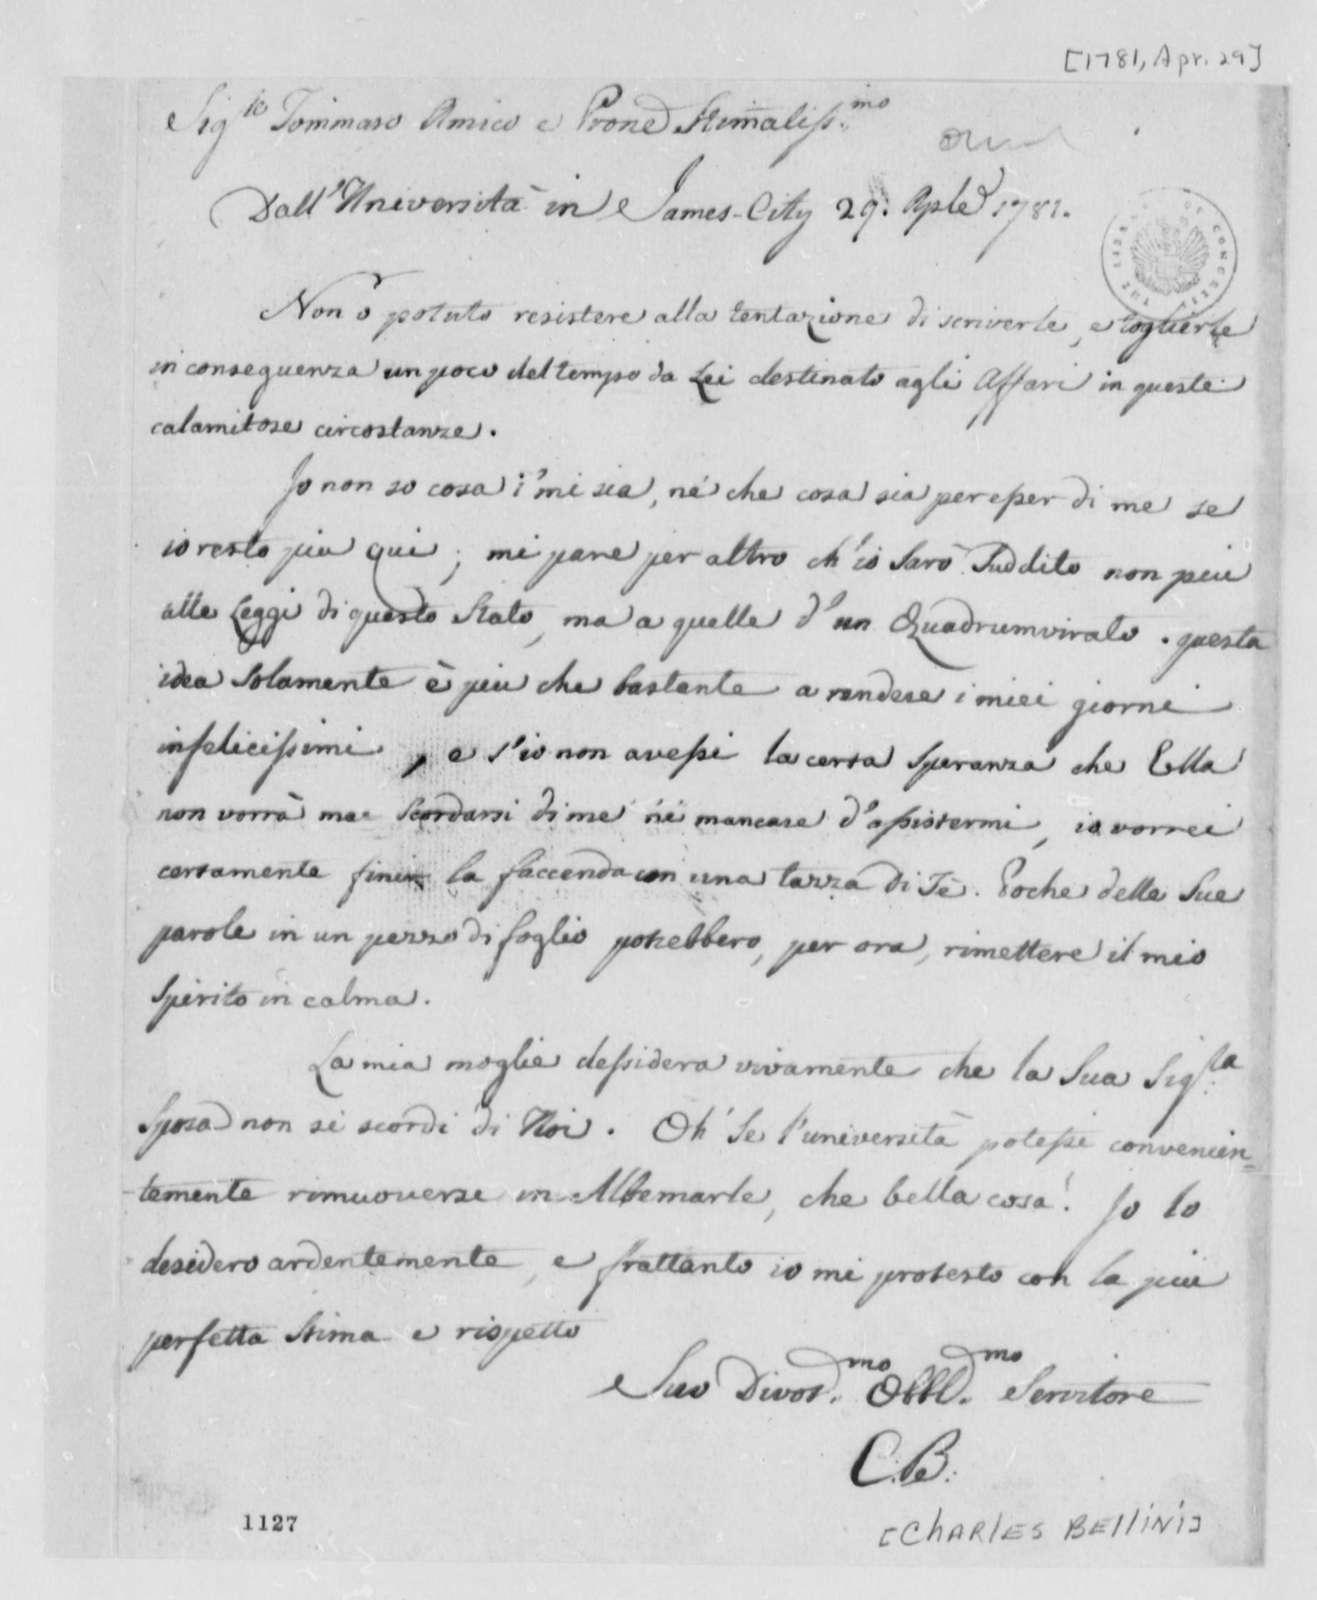 Charles Bellini to Thomas Jefferson, April 29, 1781, in Italian